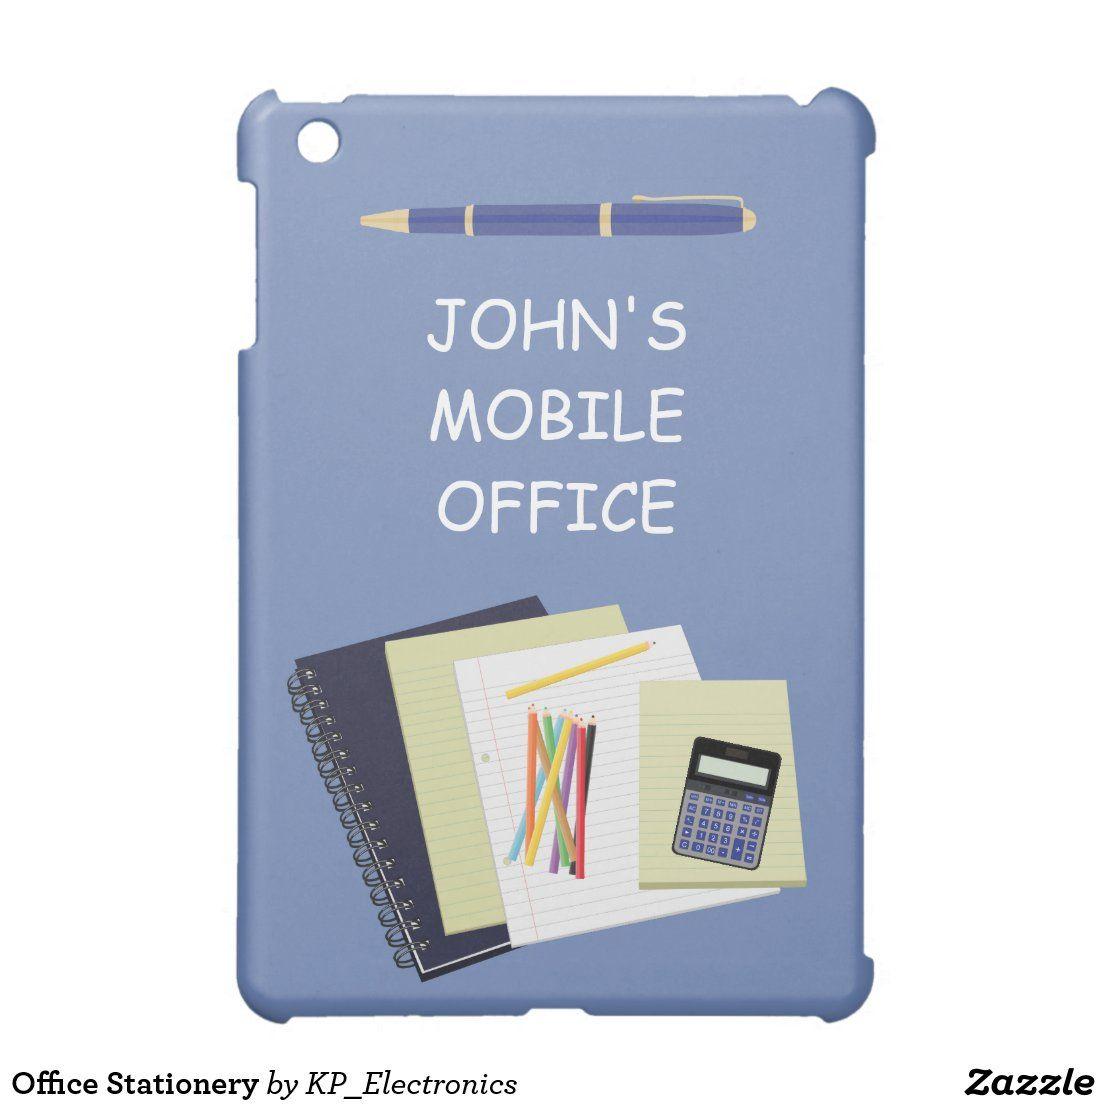 Office Stationery Case For The iPad Mini | Zazzle.com